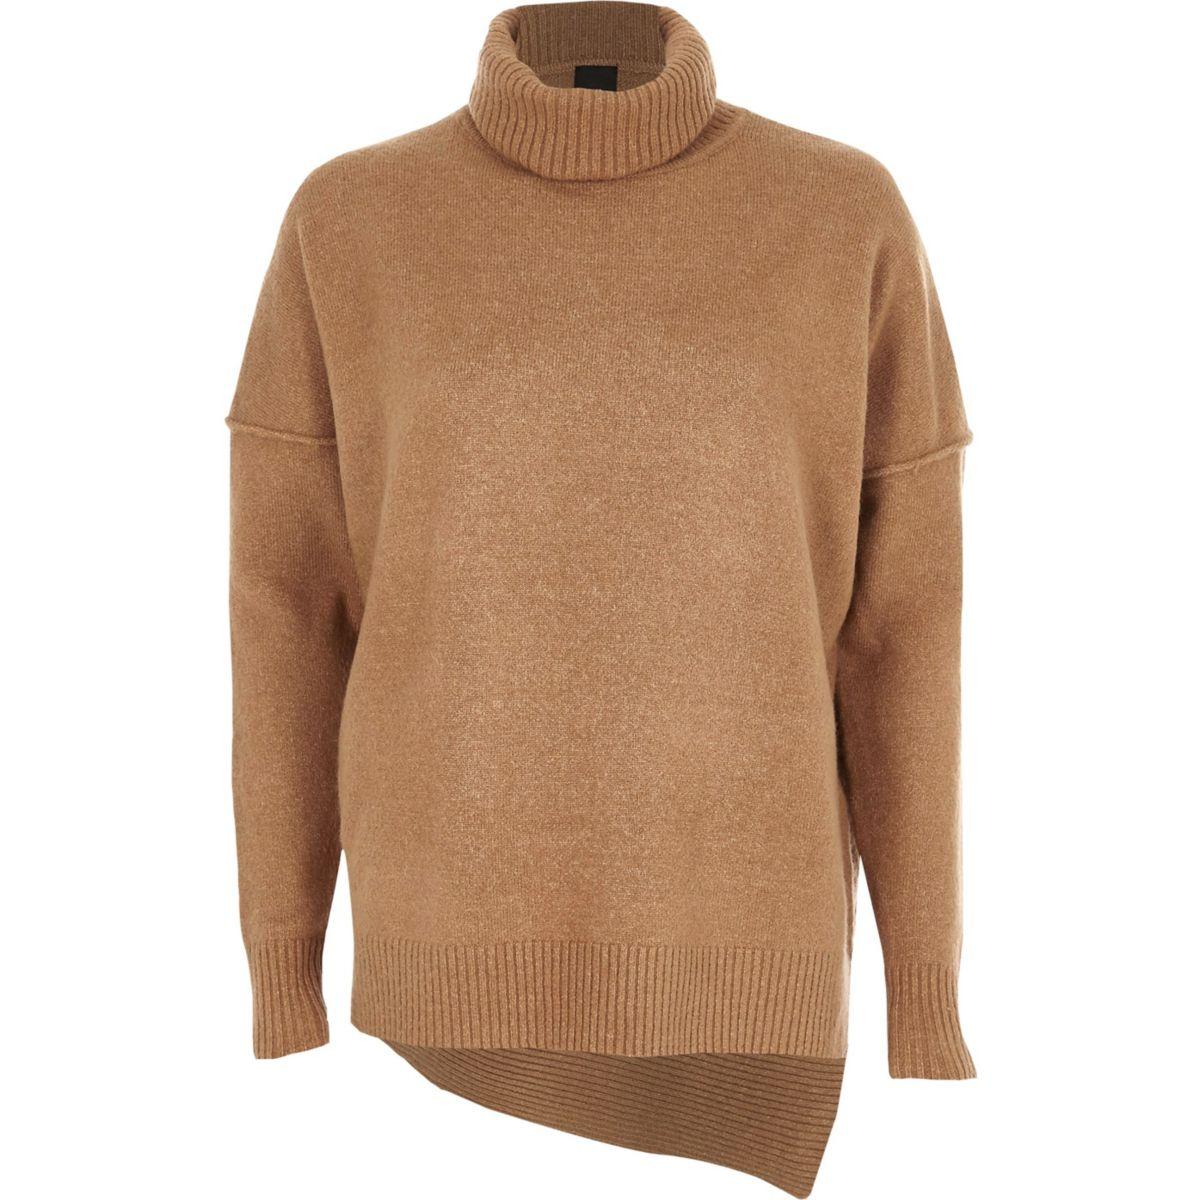 Camel asymmetric hem roll neck knit sweater